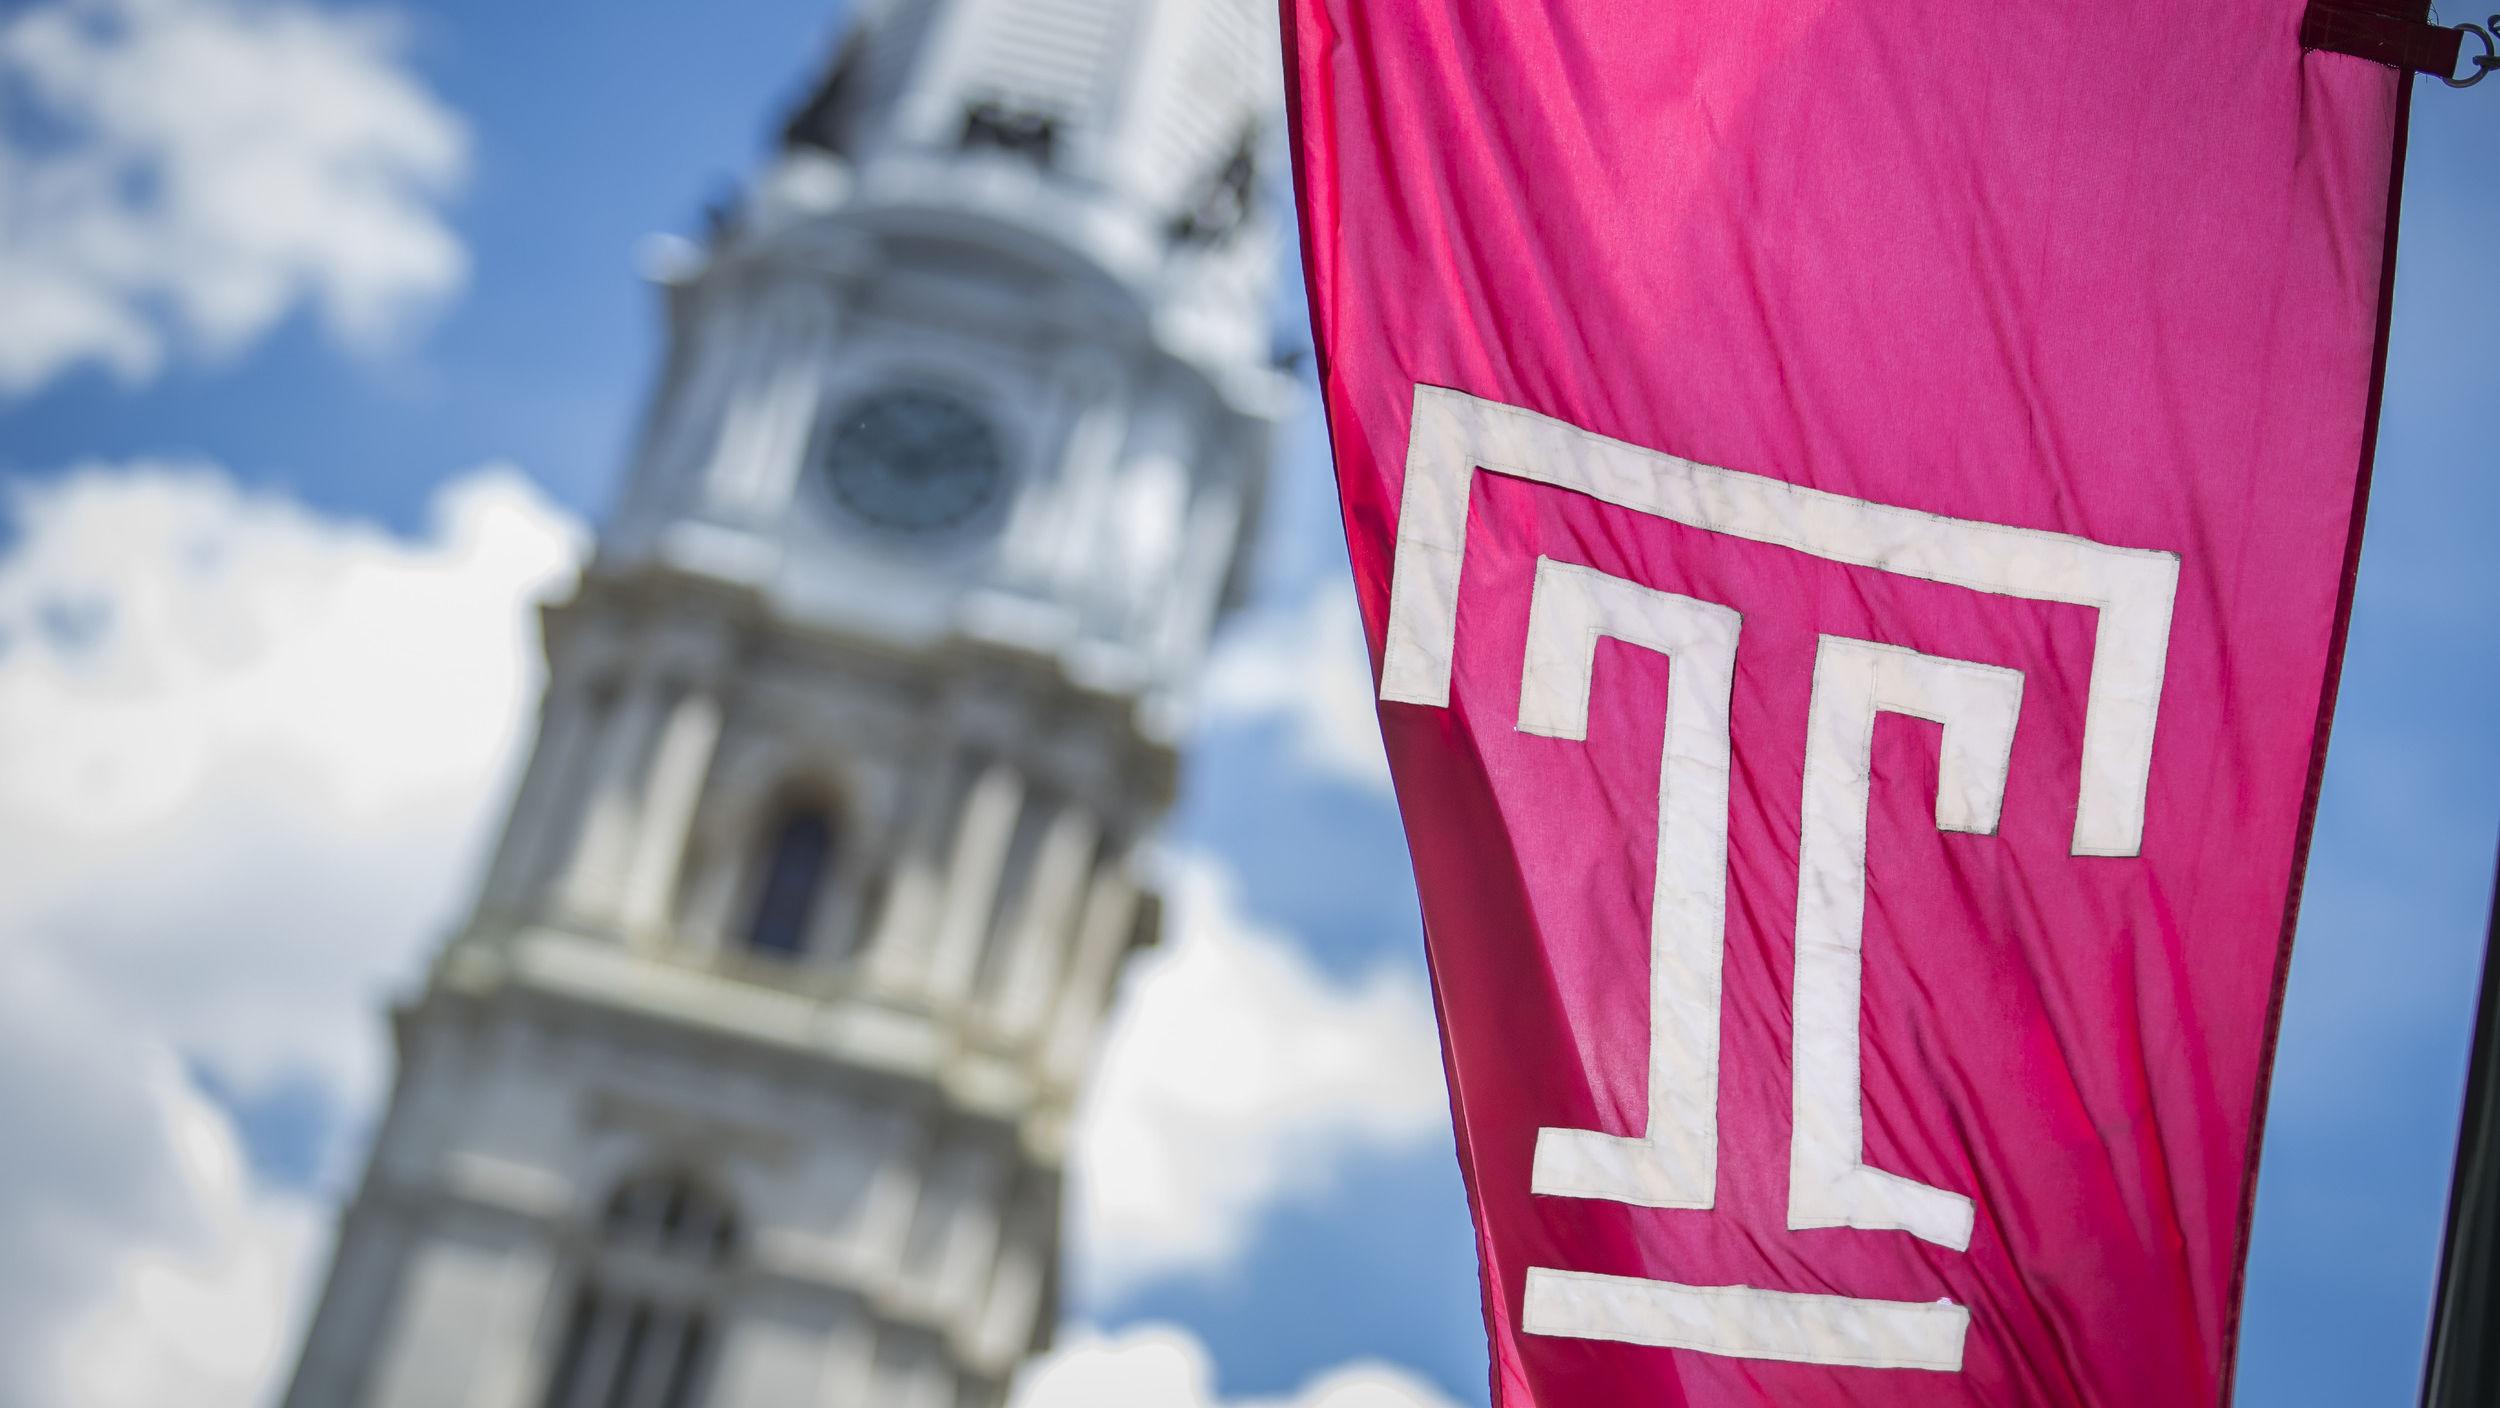 The Temple flag flies in Philadelphia